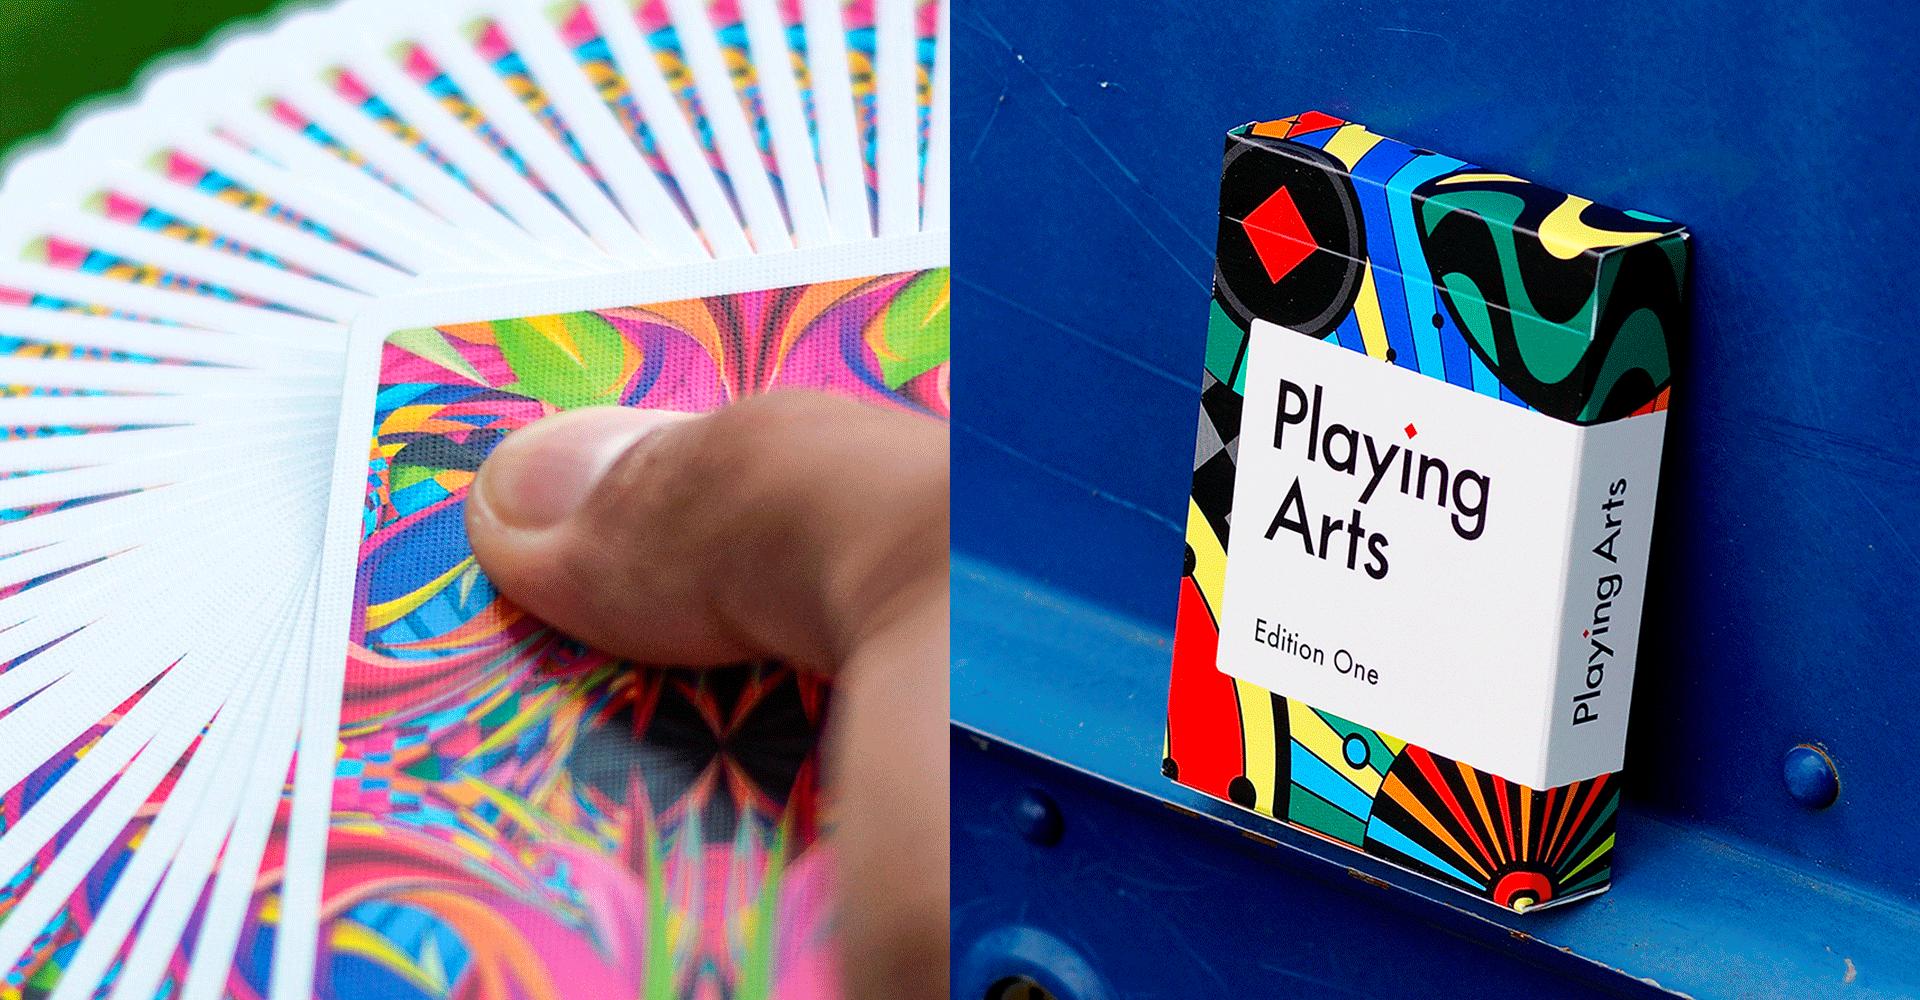 PALYING-arts-poker-chocotoy3.png